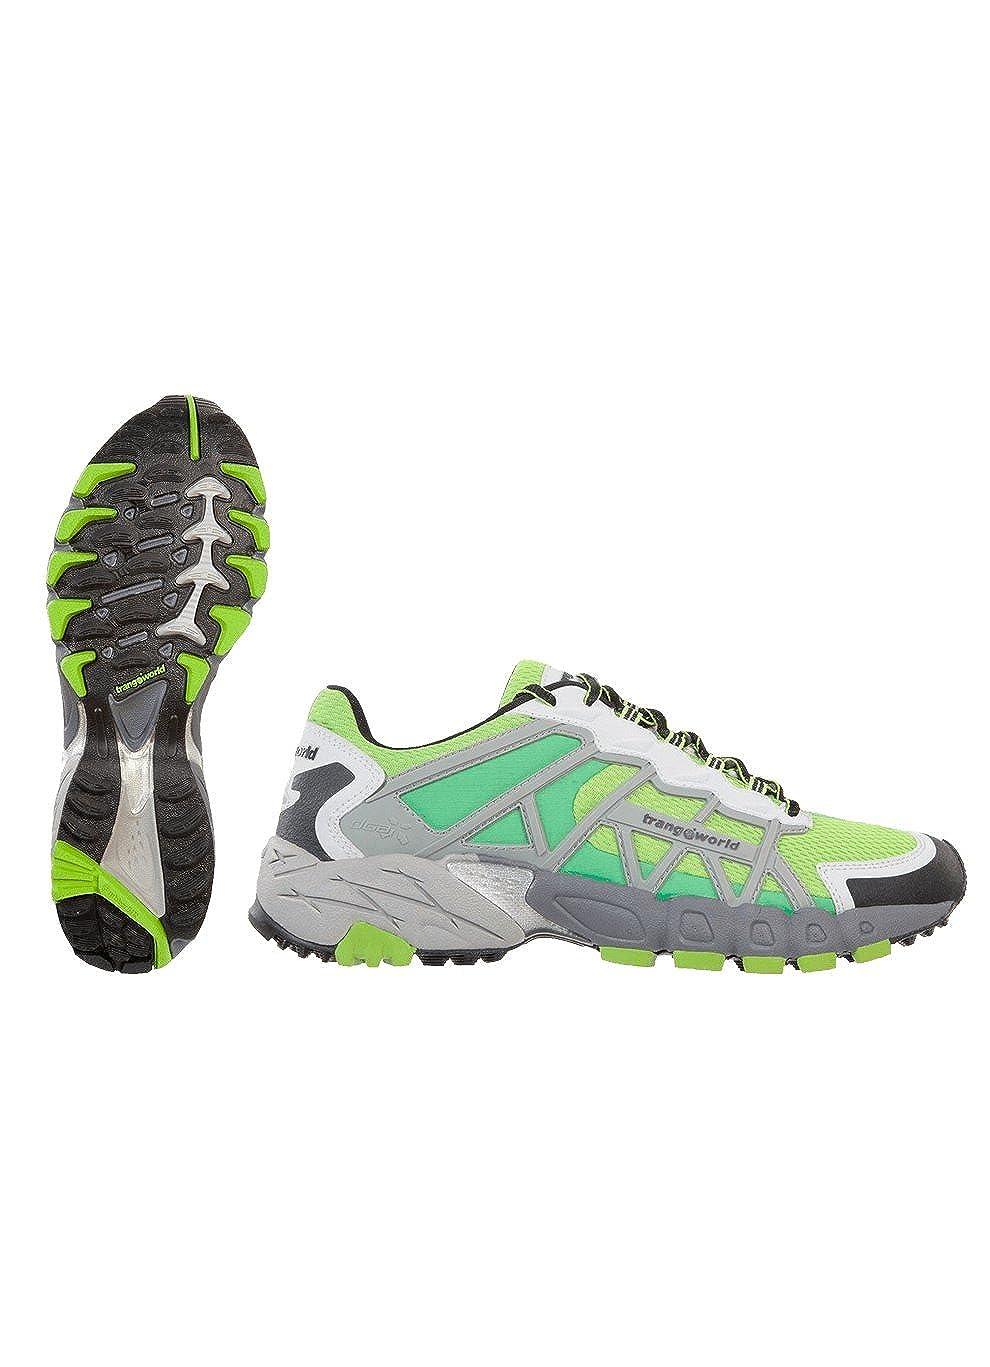 Zapatillas de Trail Running Unisex Adulto TRANGOWORLD Prowler 0109